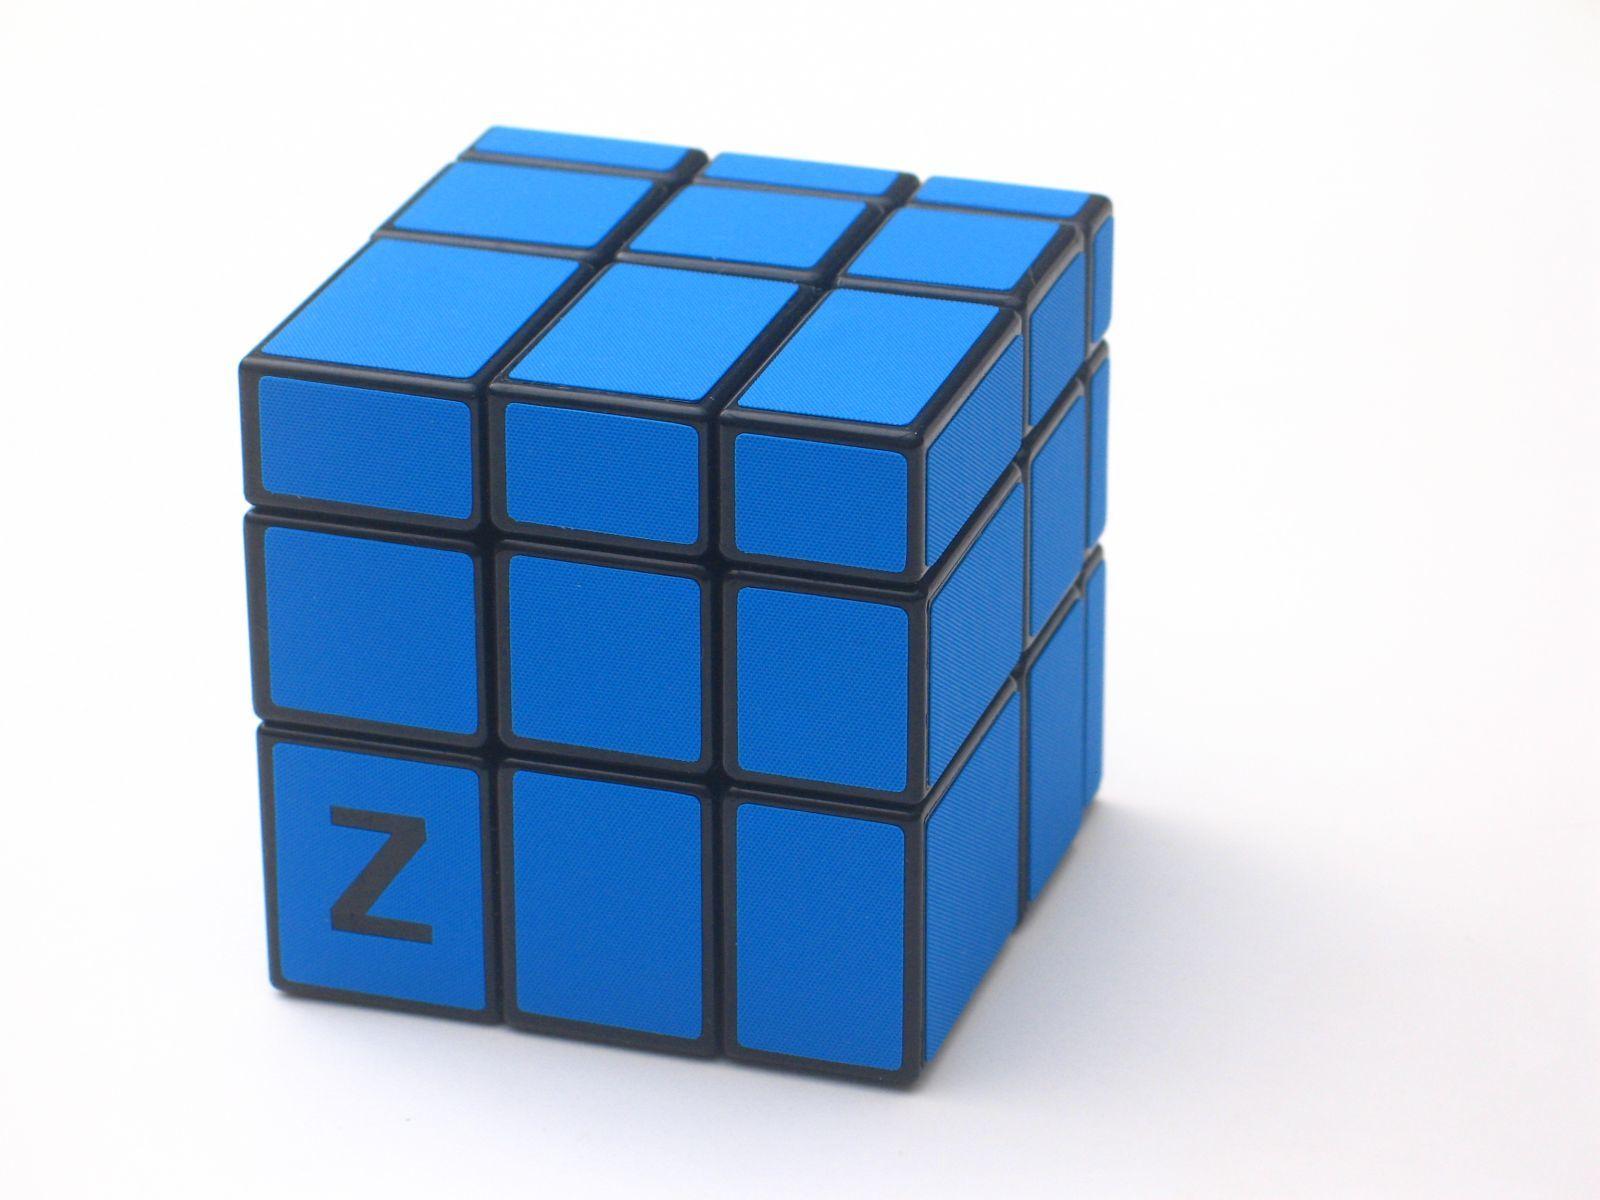 Z-Cube 3x3x3 Зеркальный куб Синий